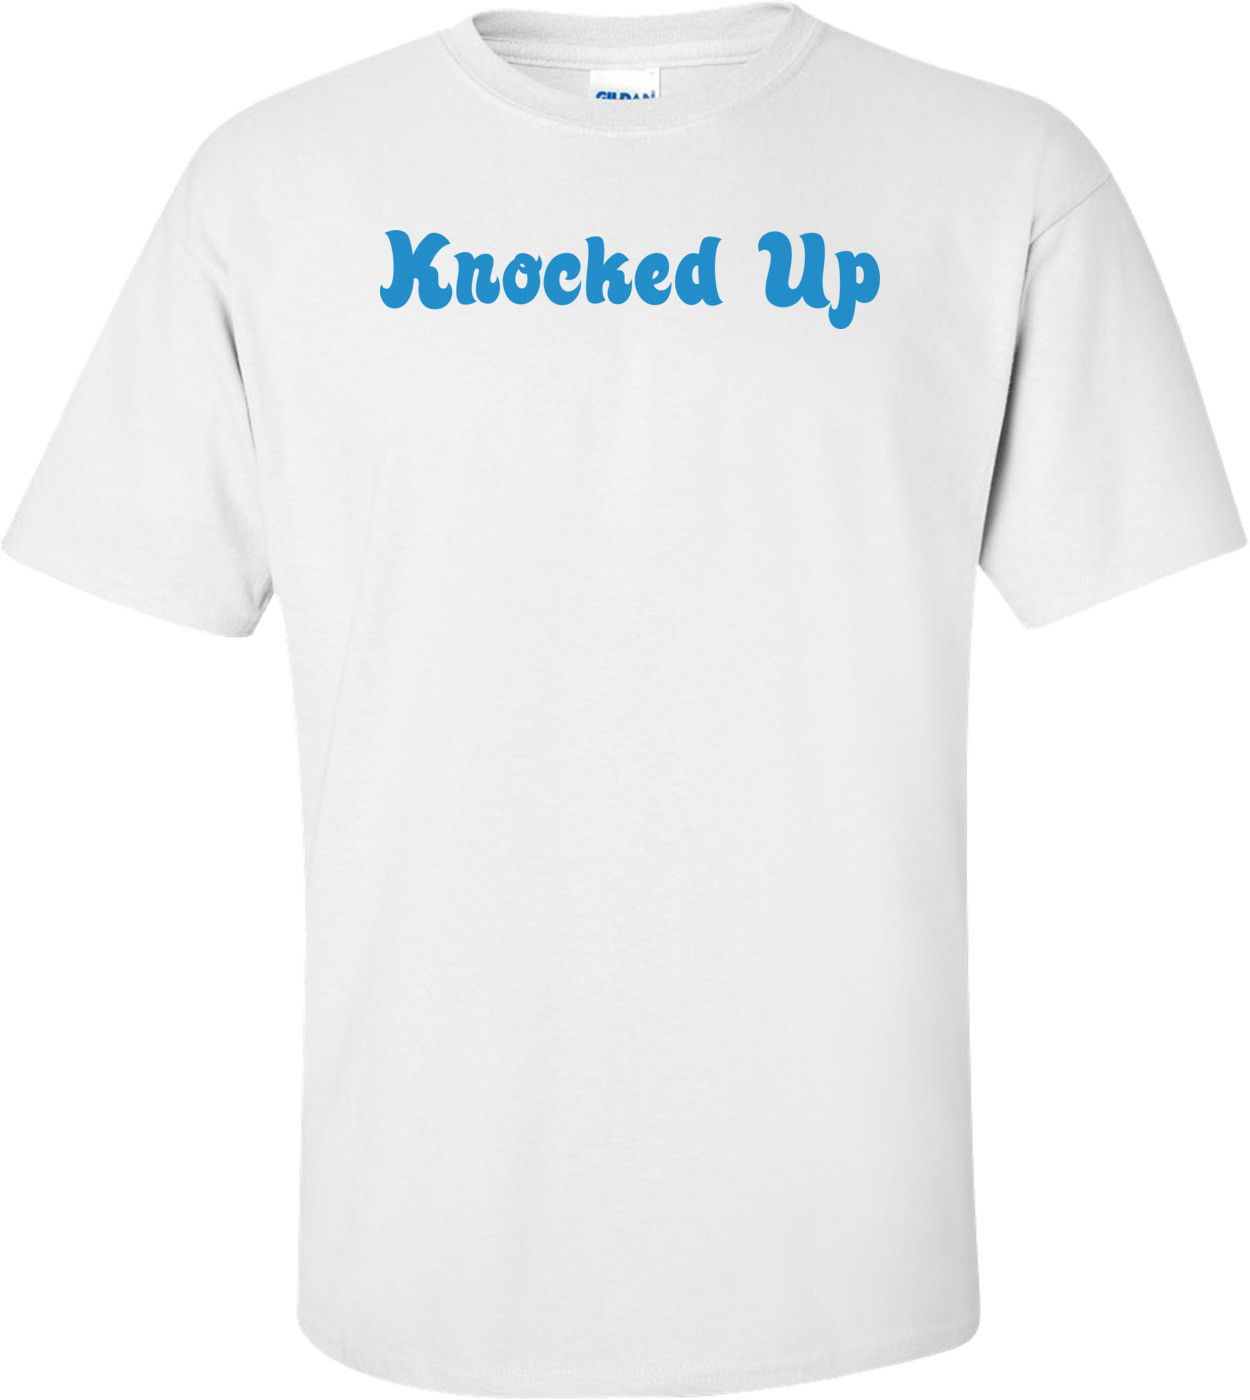 Knocked Up Funny Maternity Shirt